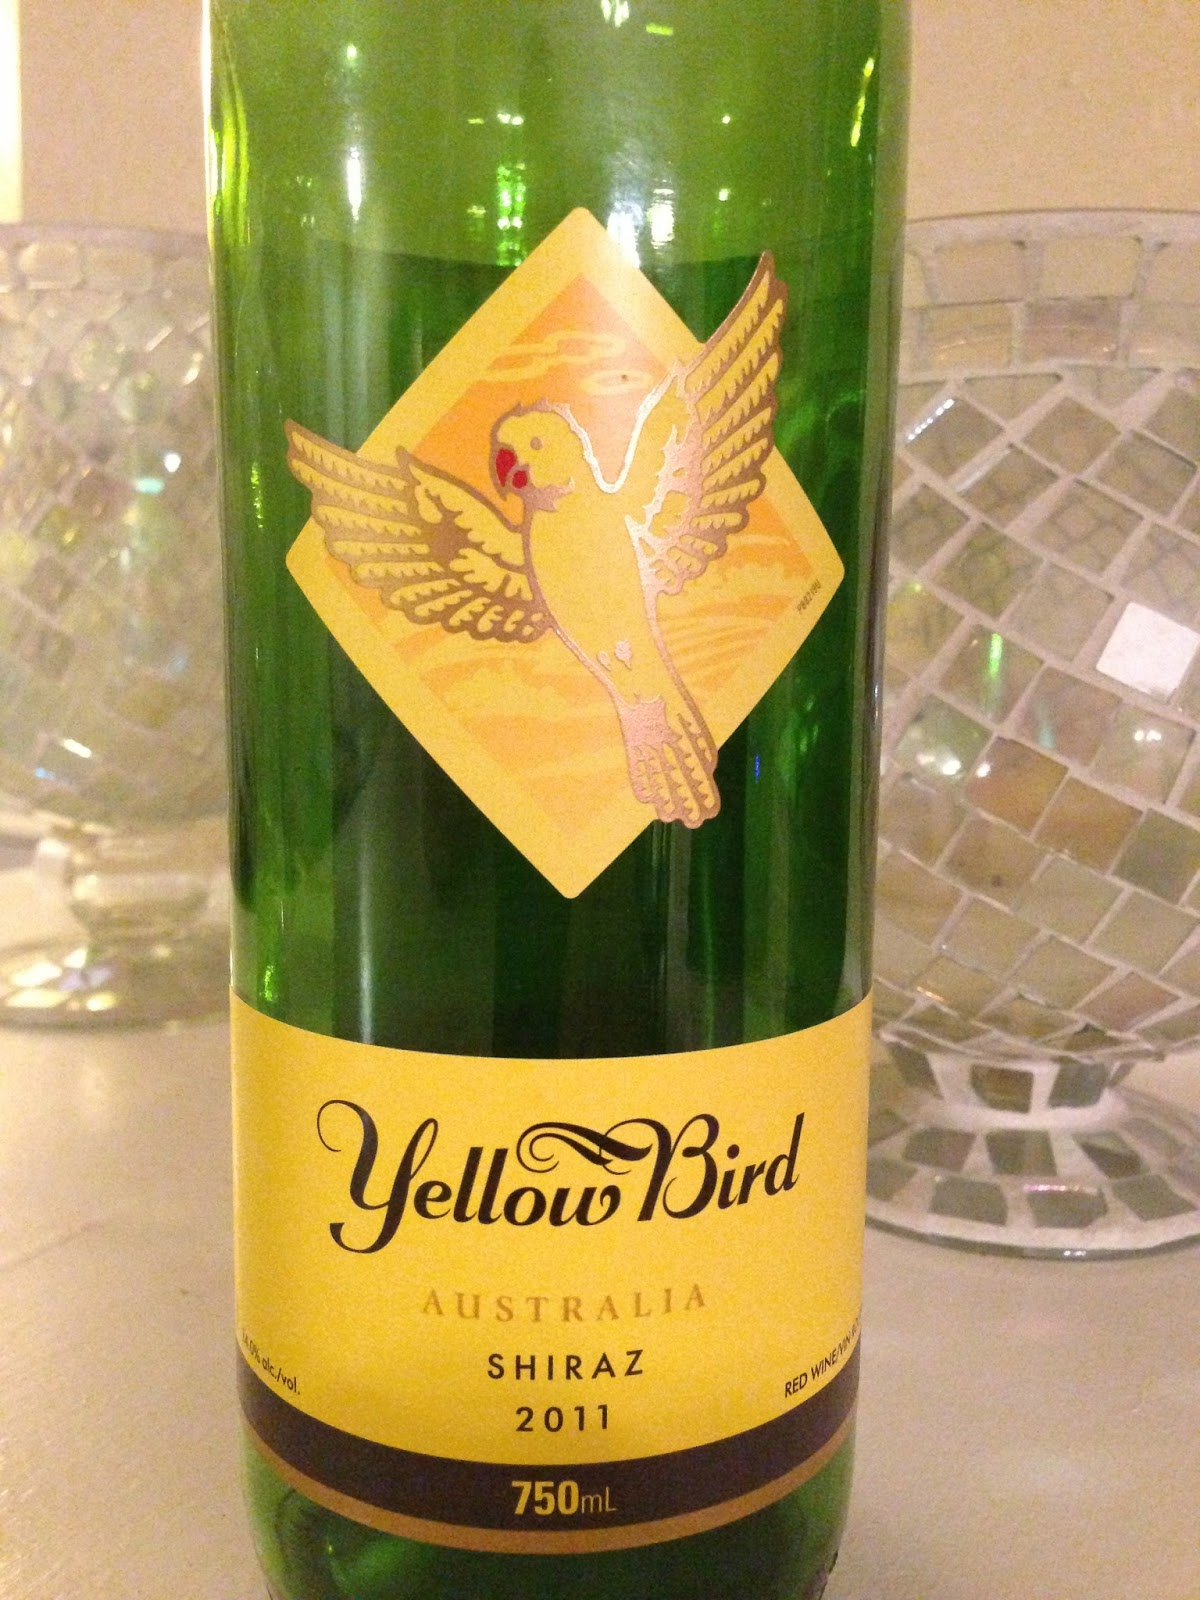 Yellow Bird Name Name Yellow Bird Shiraz